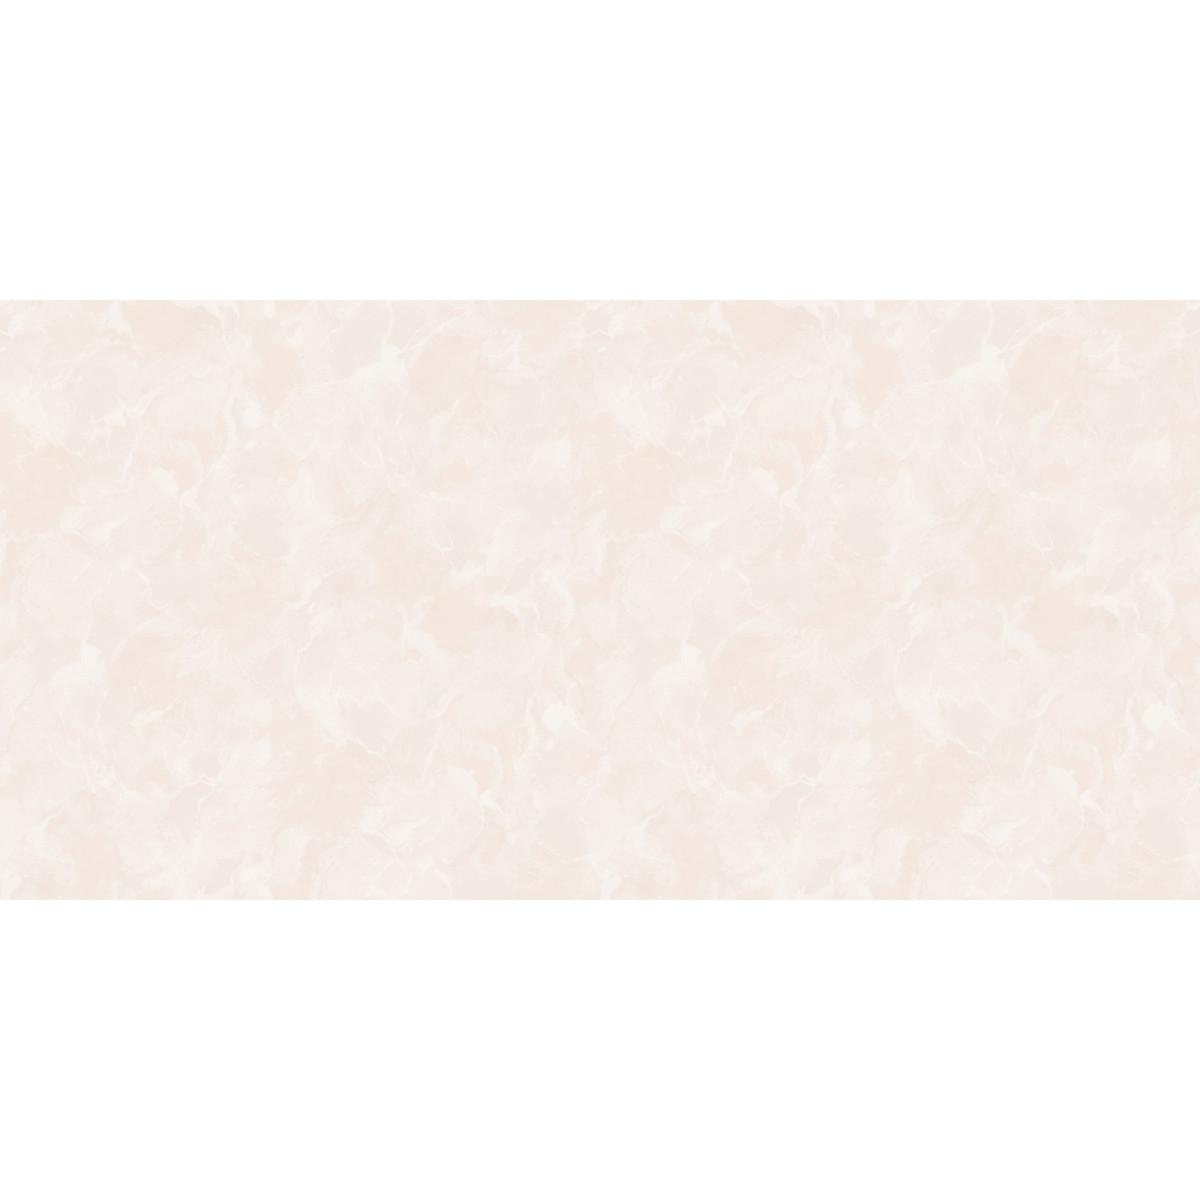 Обои флизелиновые Wallberry Шанель бежевые 1.06 м 4052